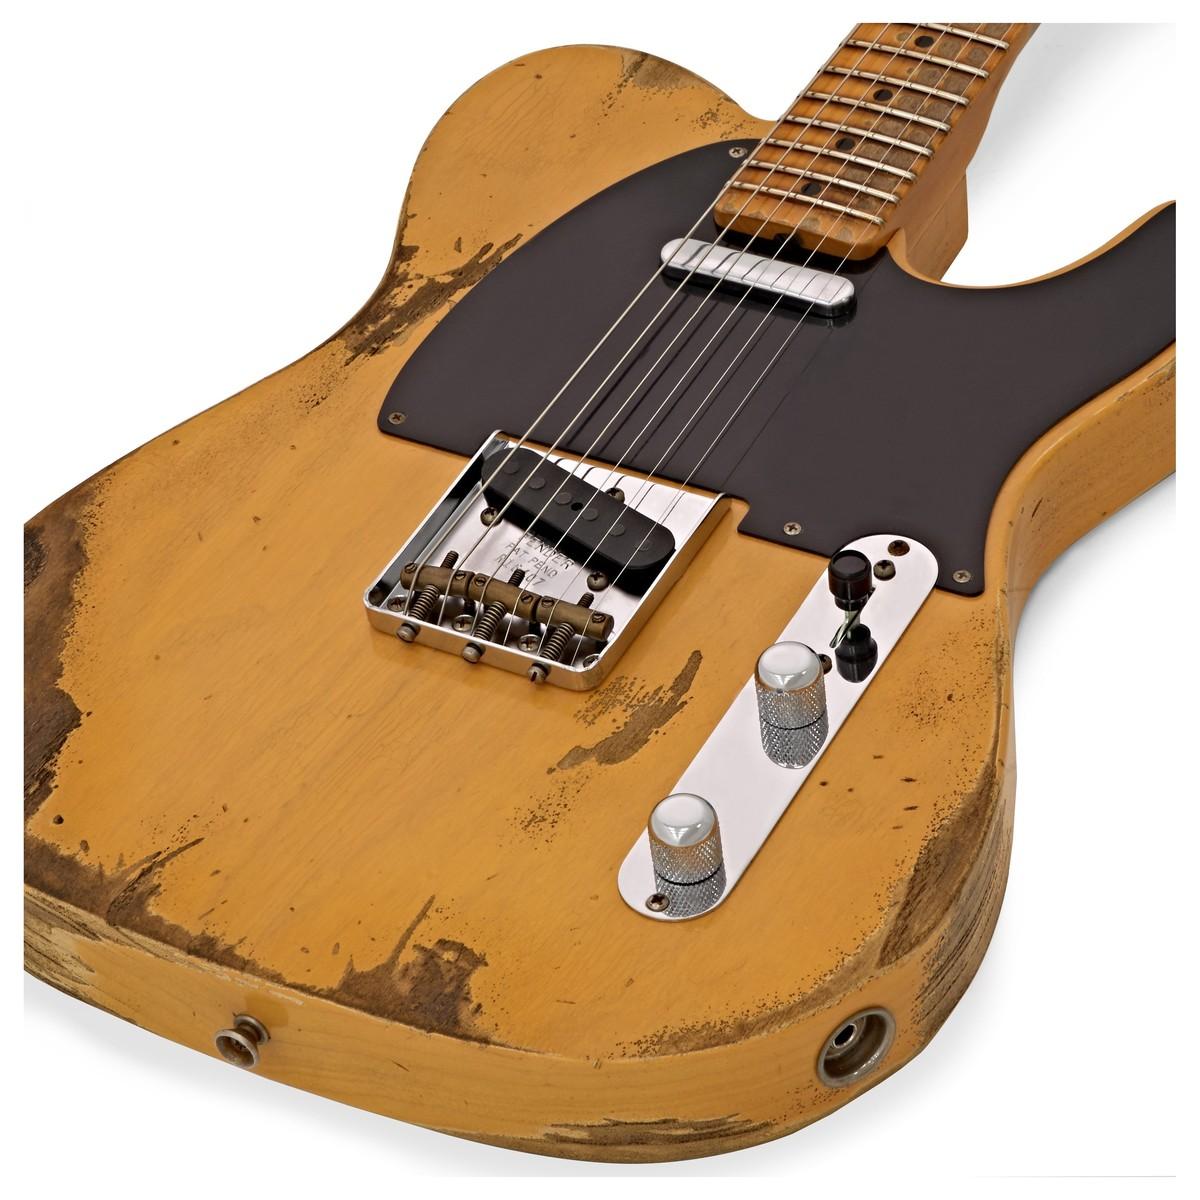 fender custom shop 1953 heavy relic telecaster butterscotch r16407 at gear4music. Black Bedroom Furniture Sets. Home Design Ideas